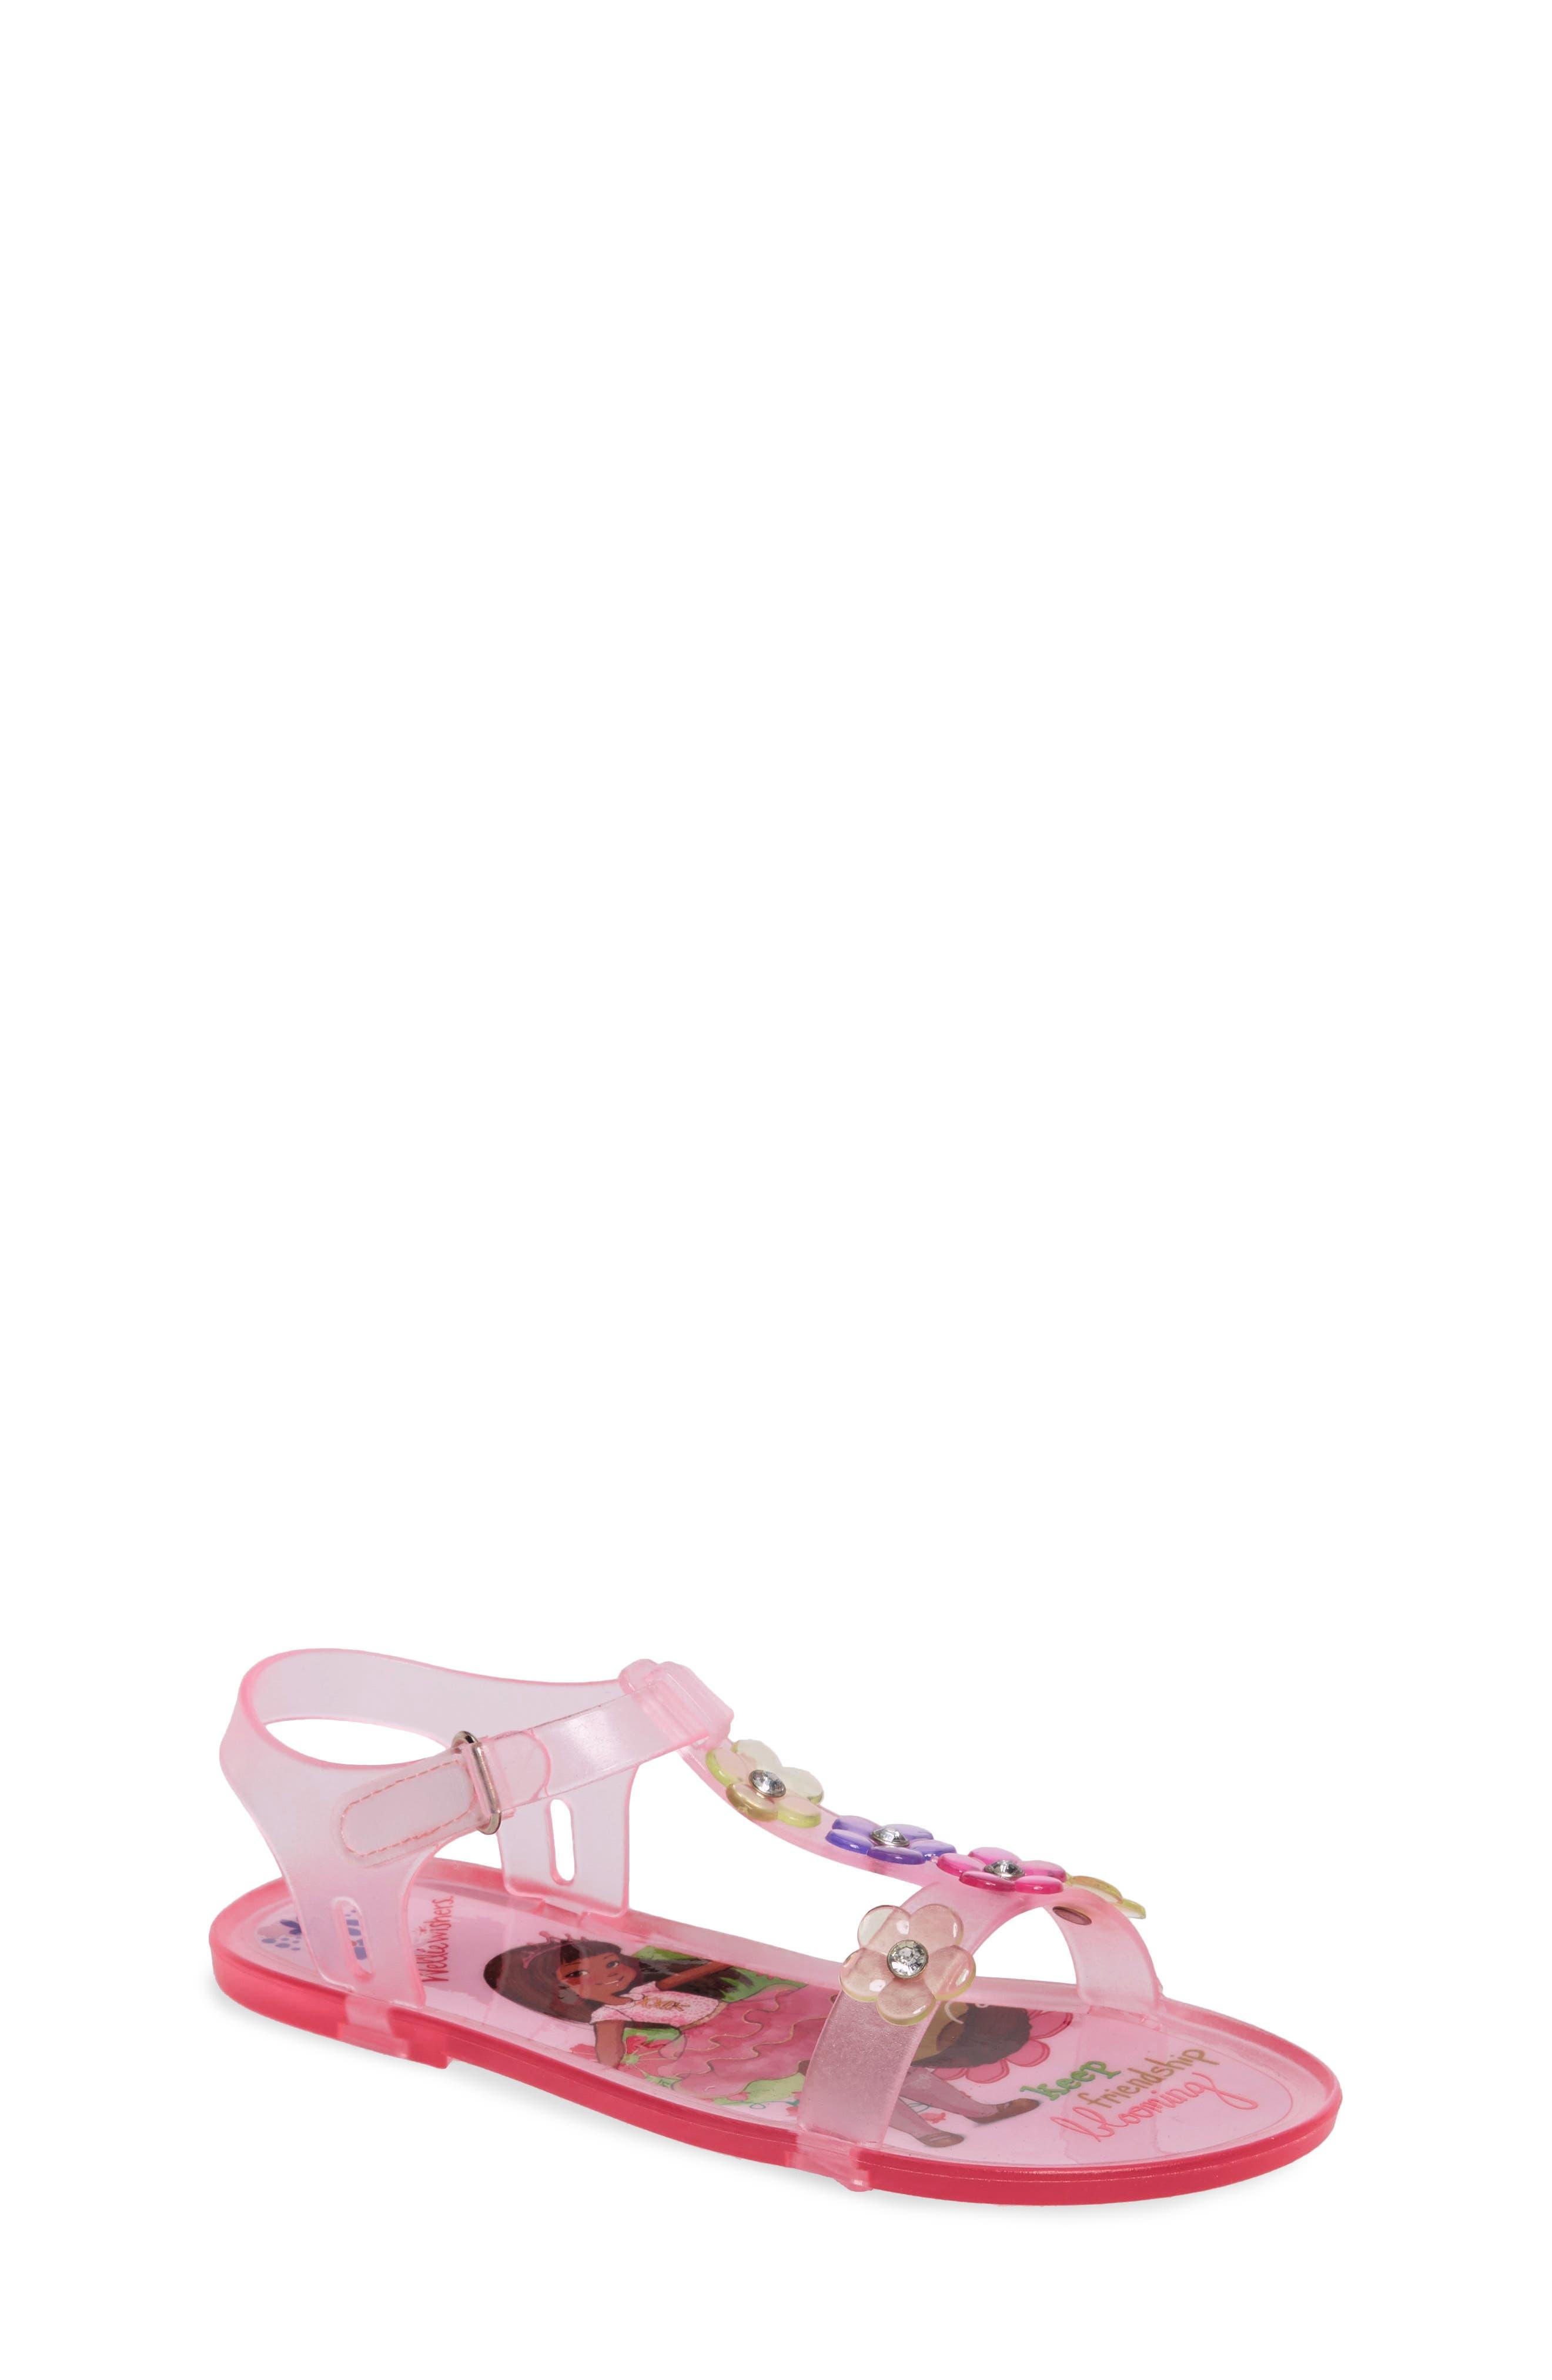 Ashlyn Flower Jelly Sandal,                             Main thumbnail 1, color,                             652